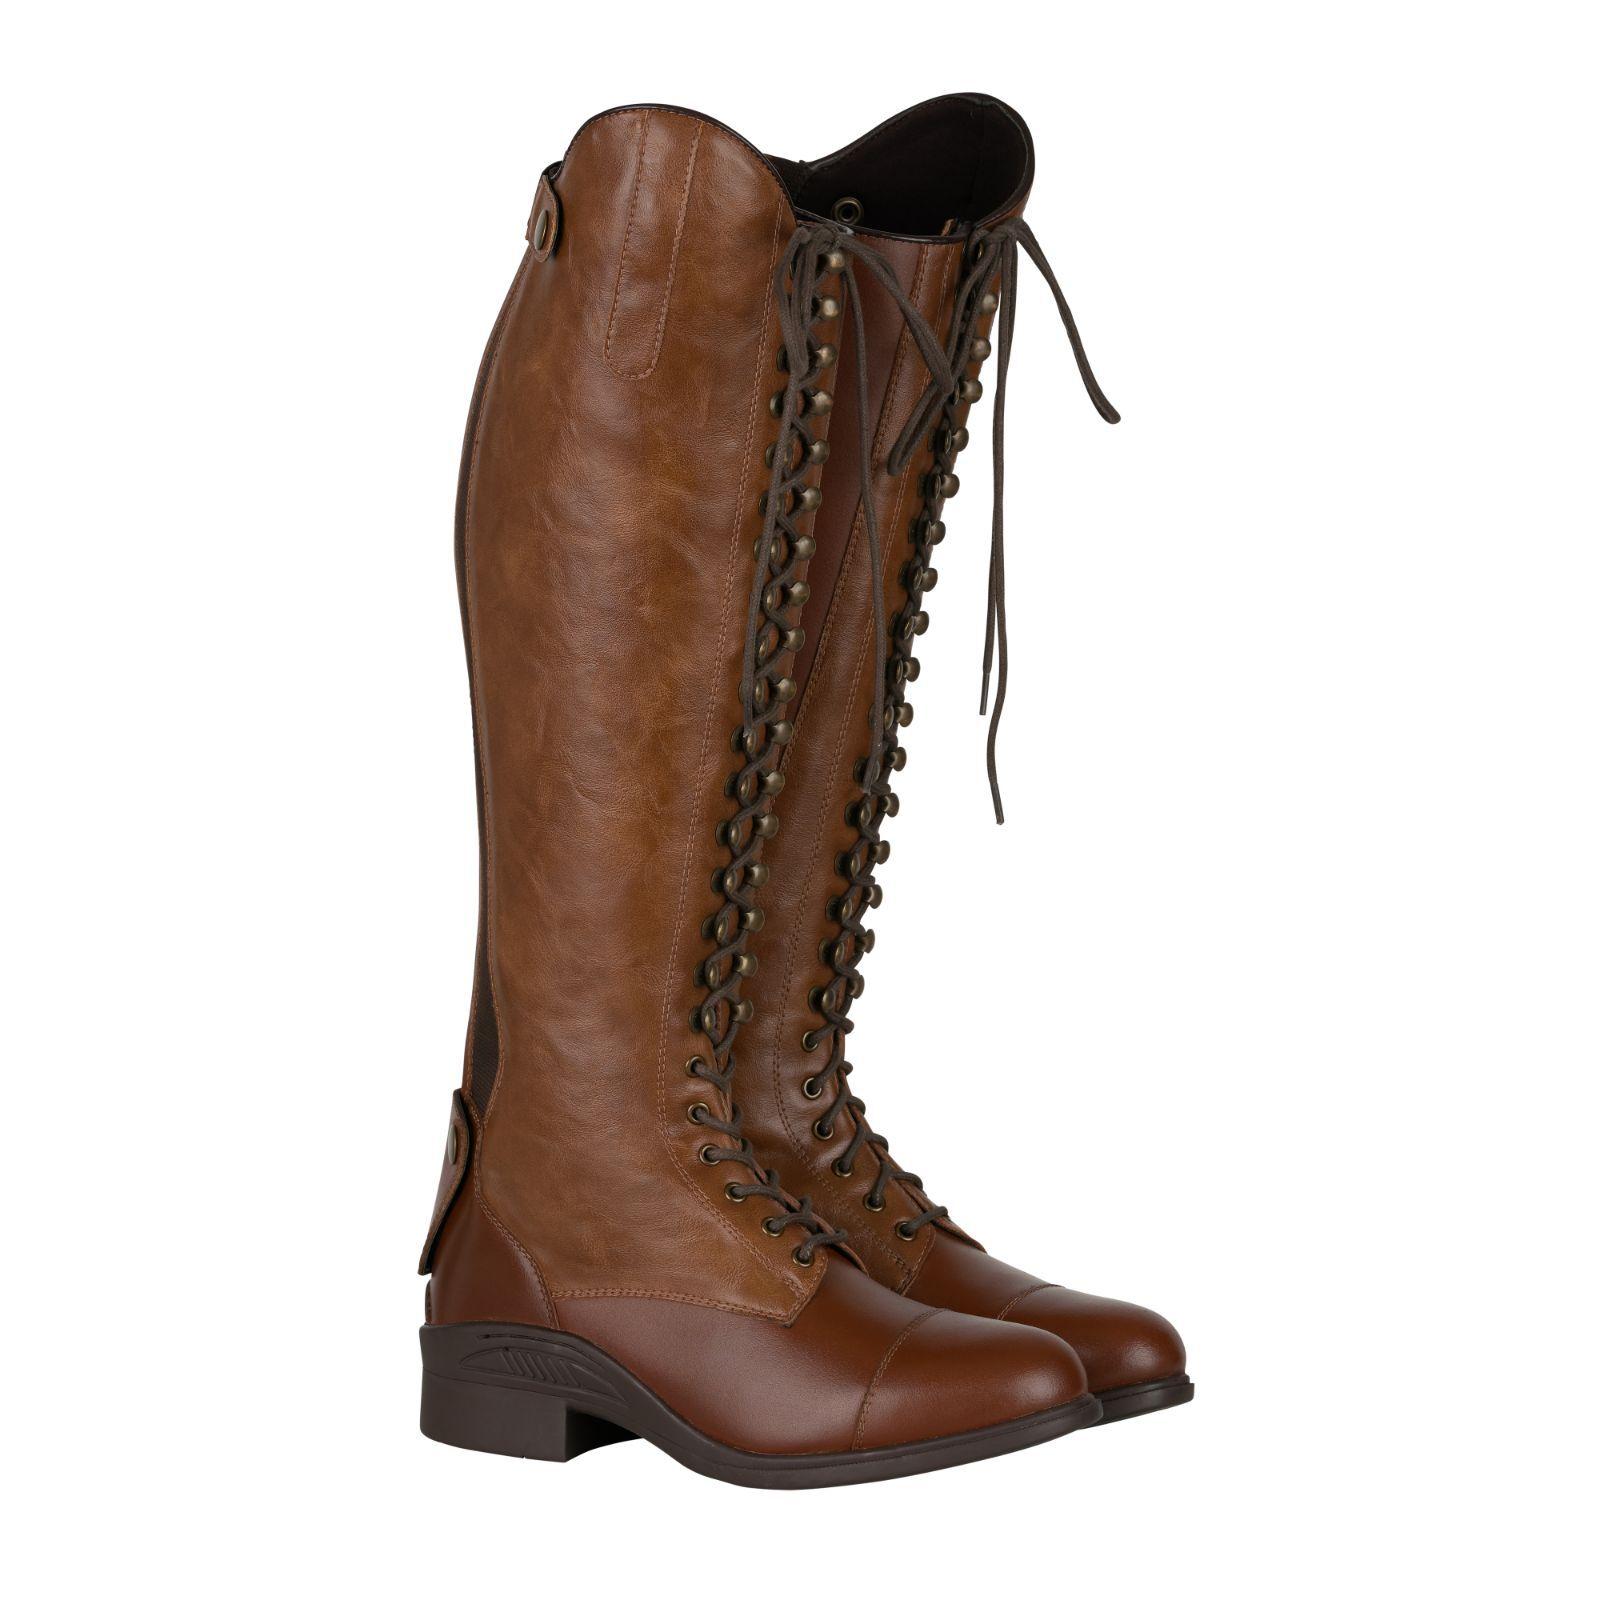 Women's Lace-Up Riding Boots | Horze